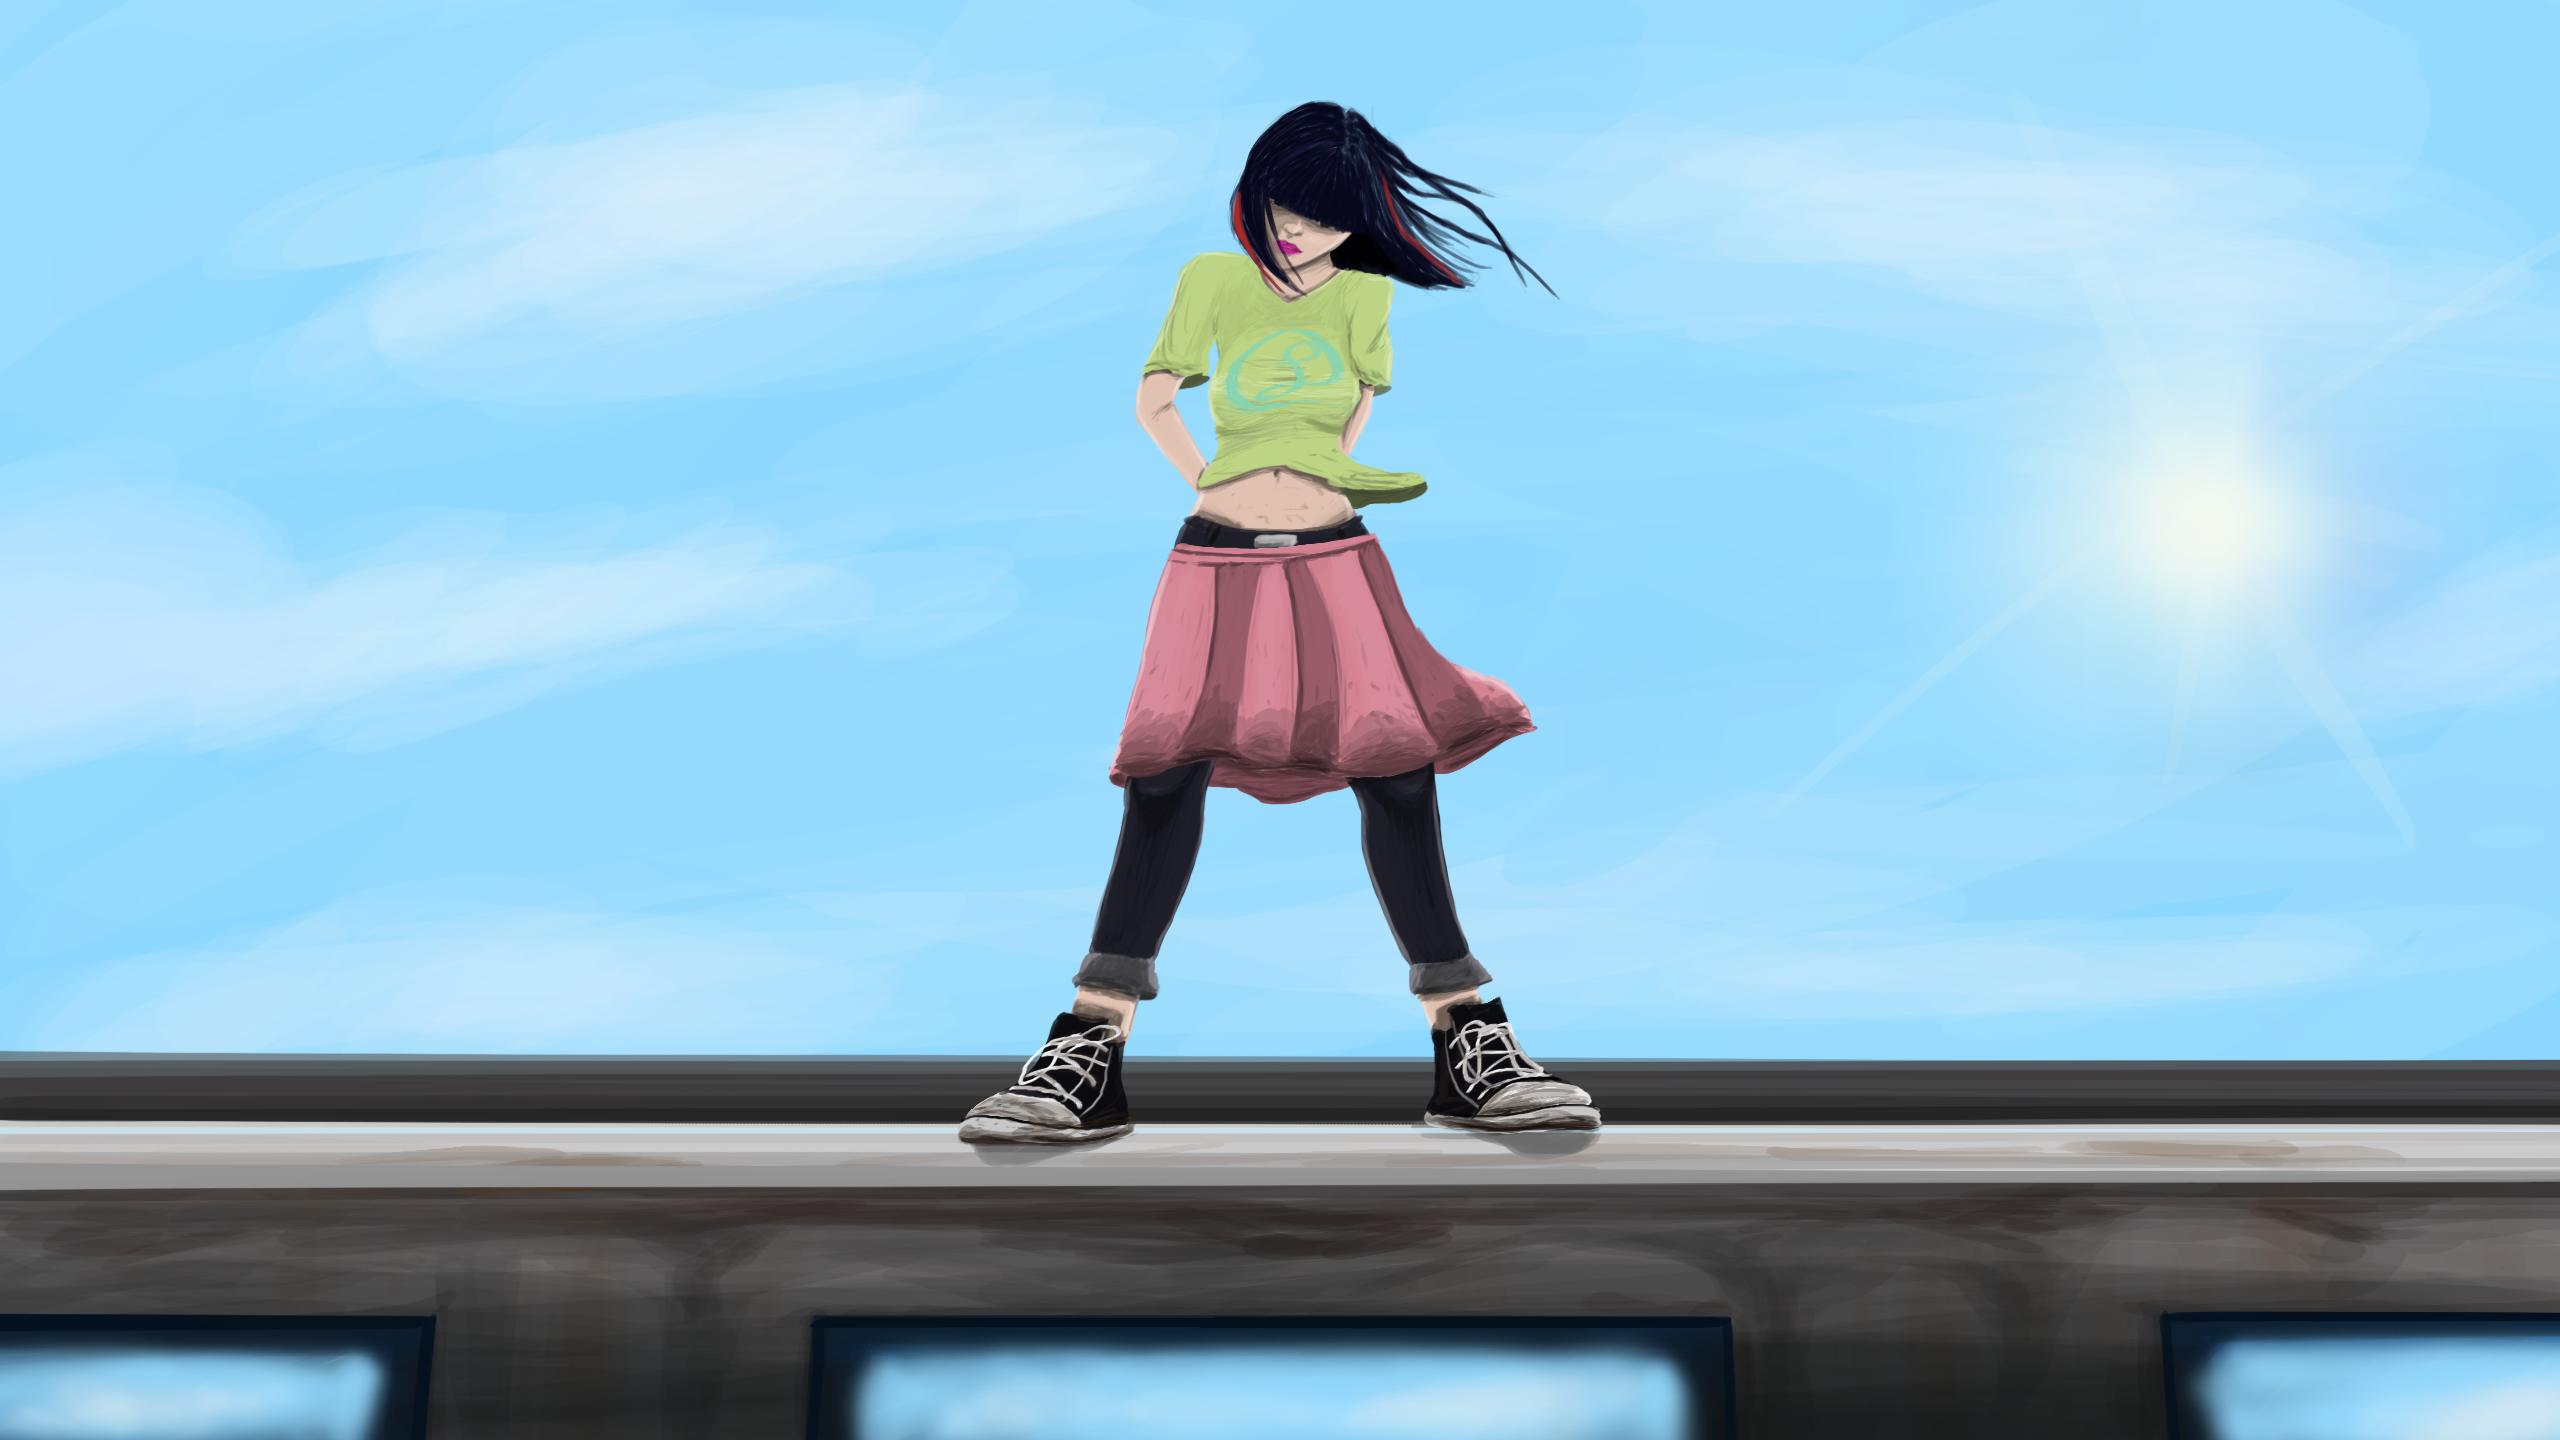 Rooftop Girl